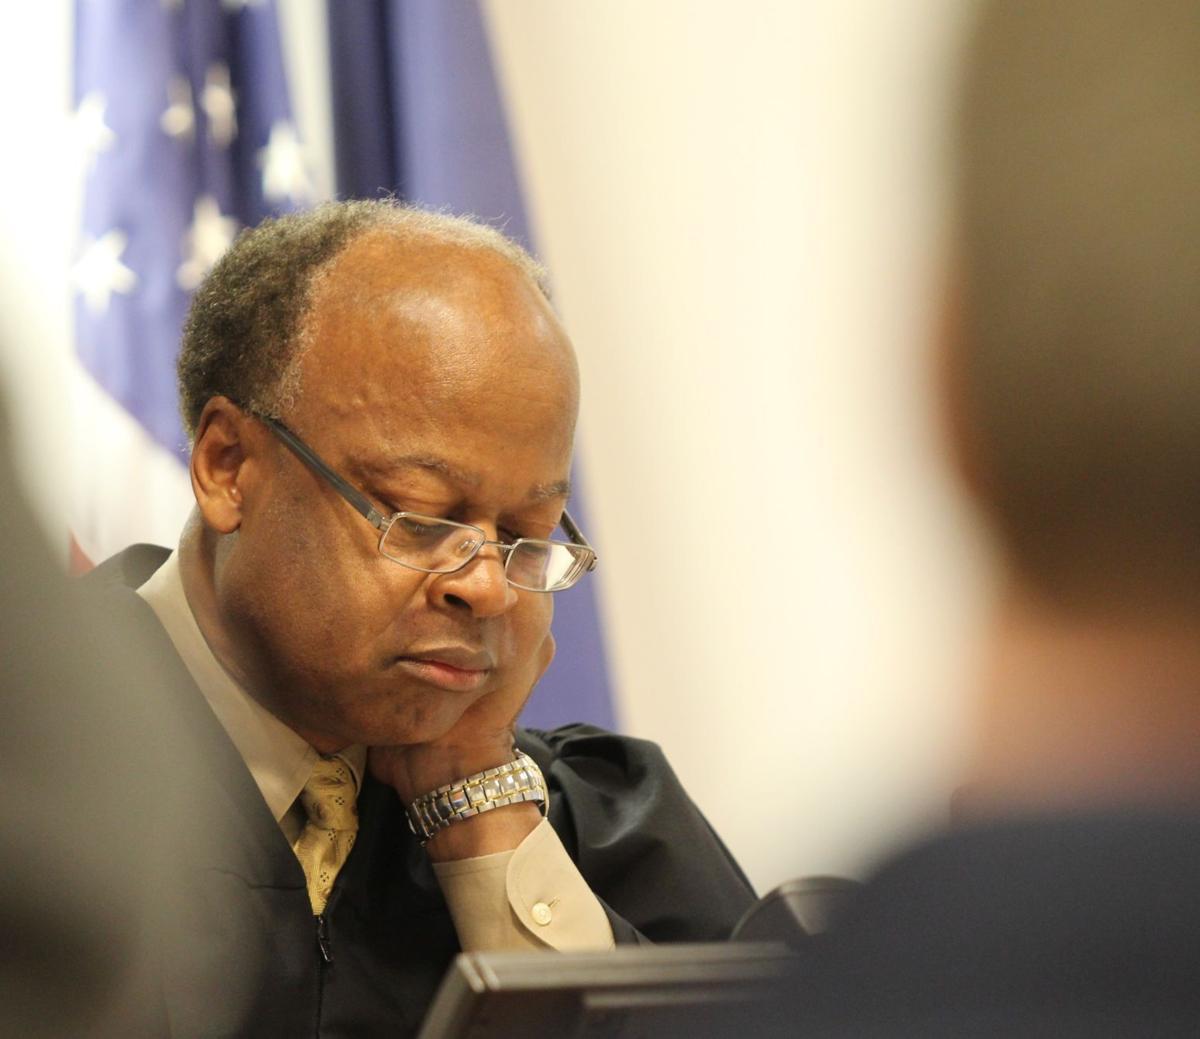 Judge Jeffrey Harris